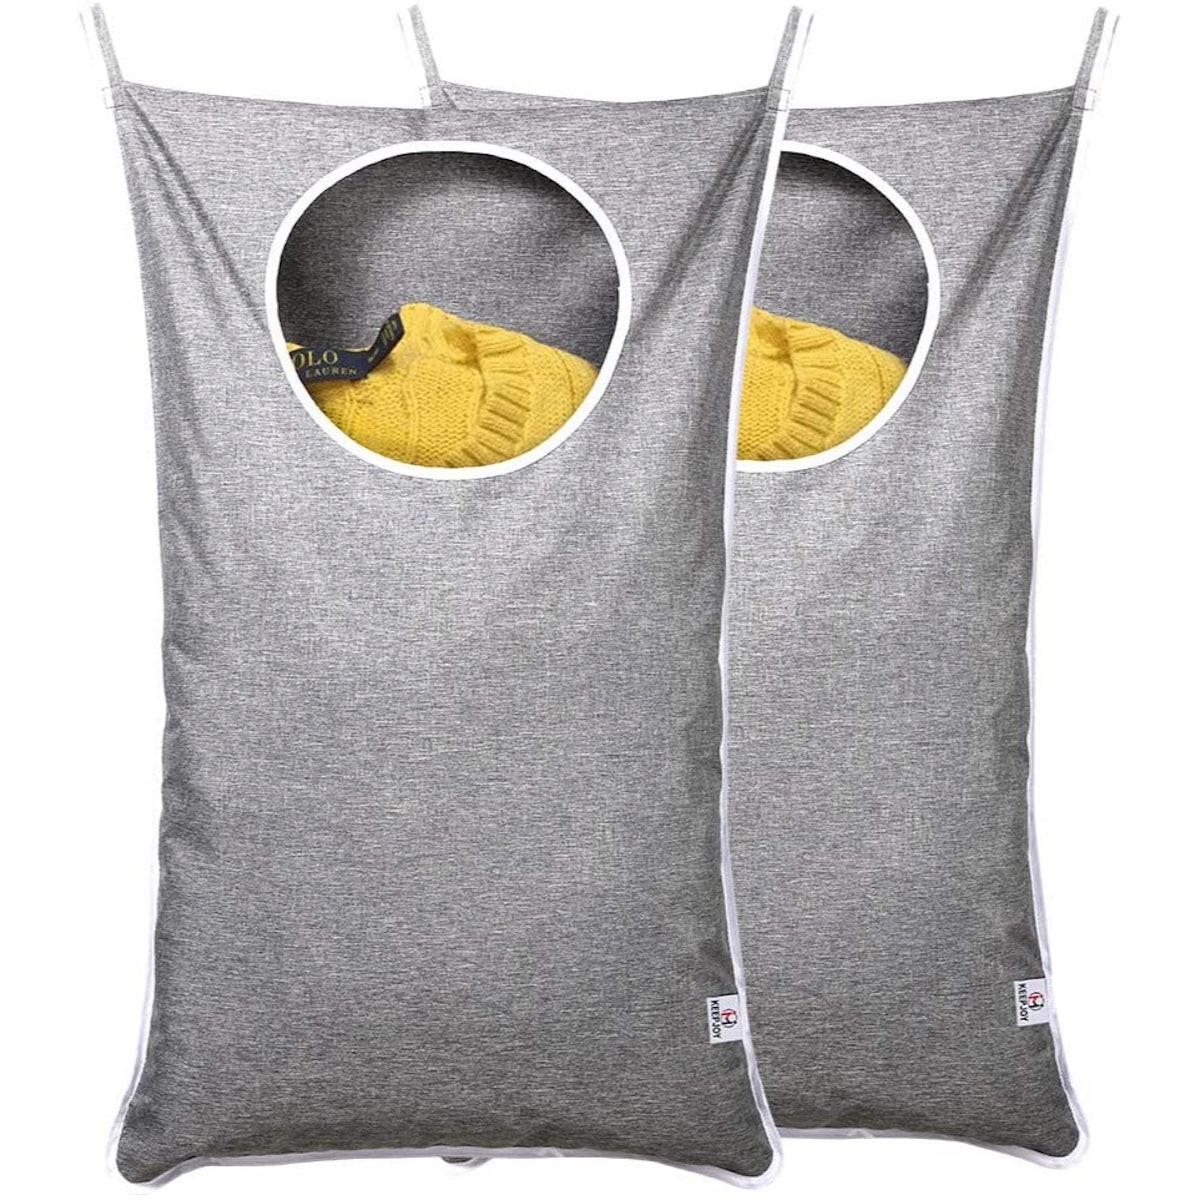 KEEPJOY Hanging Laundry Bag (2-Pack)